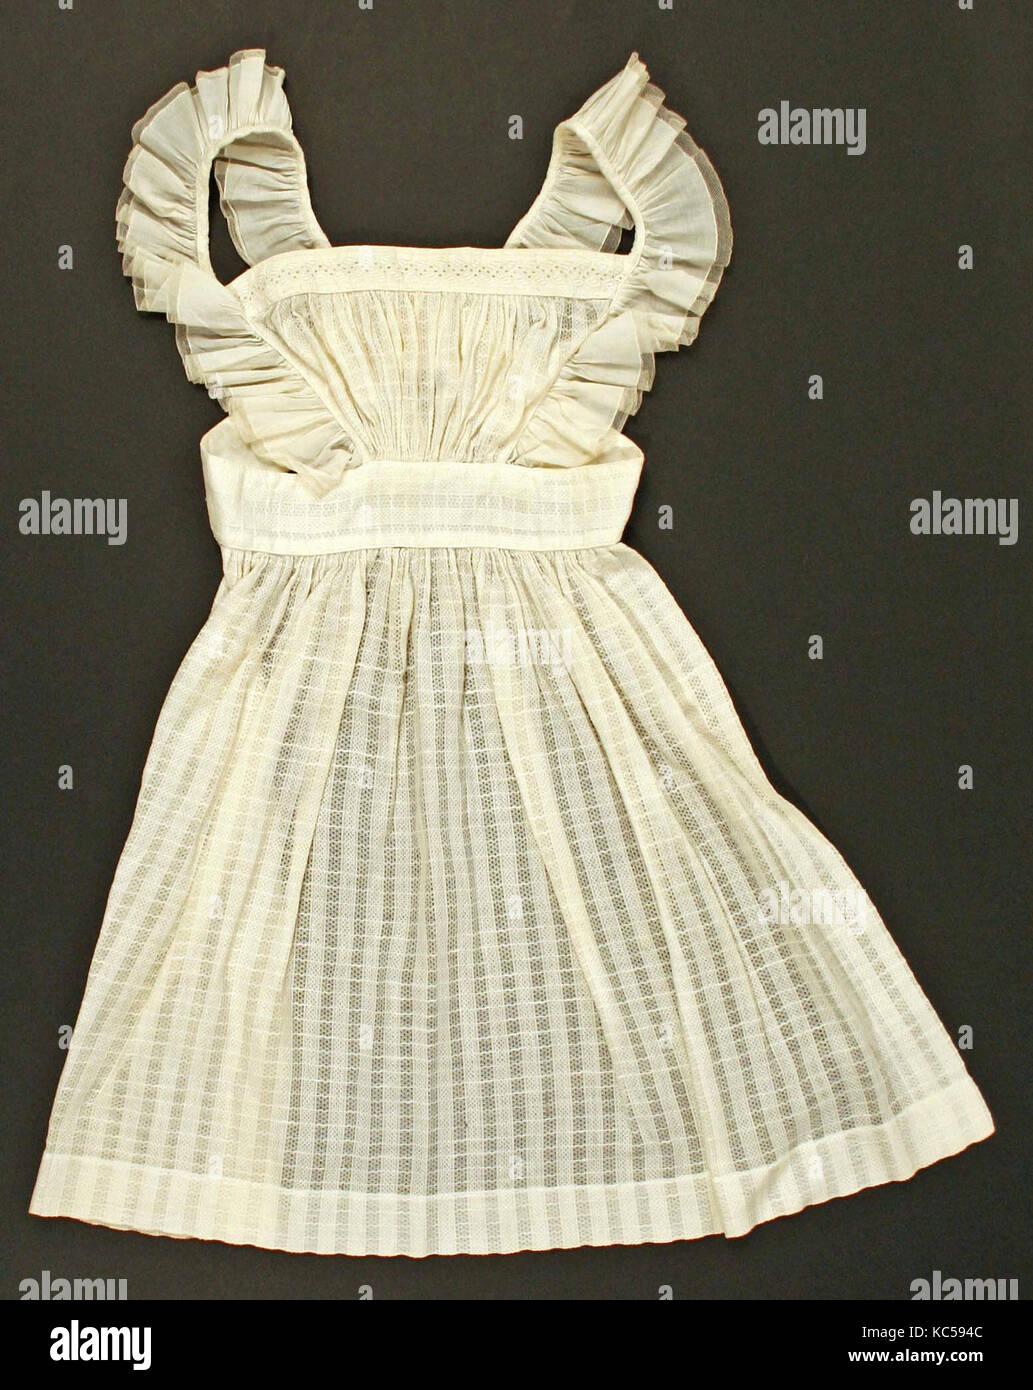 Accessory set, 1830s, American or European, cotton - Stock Image